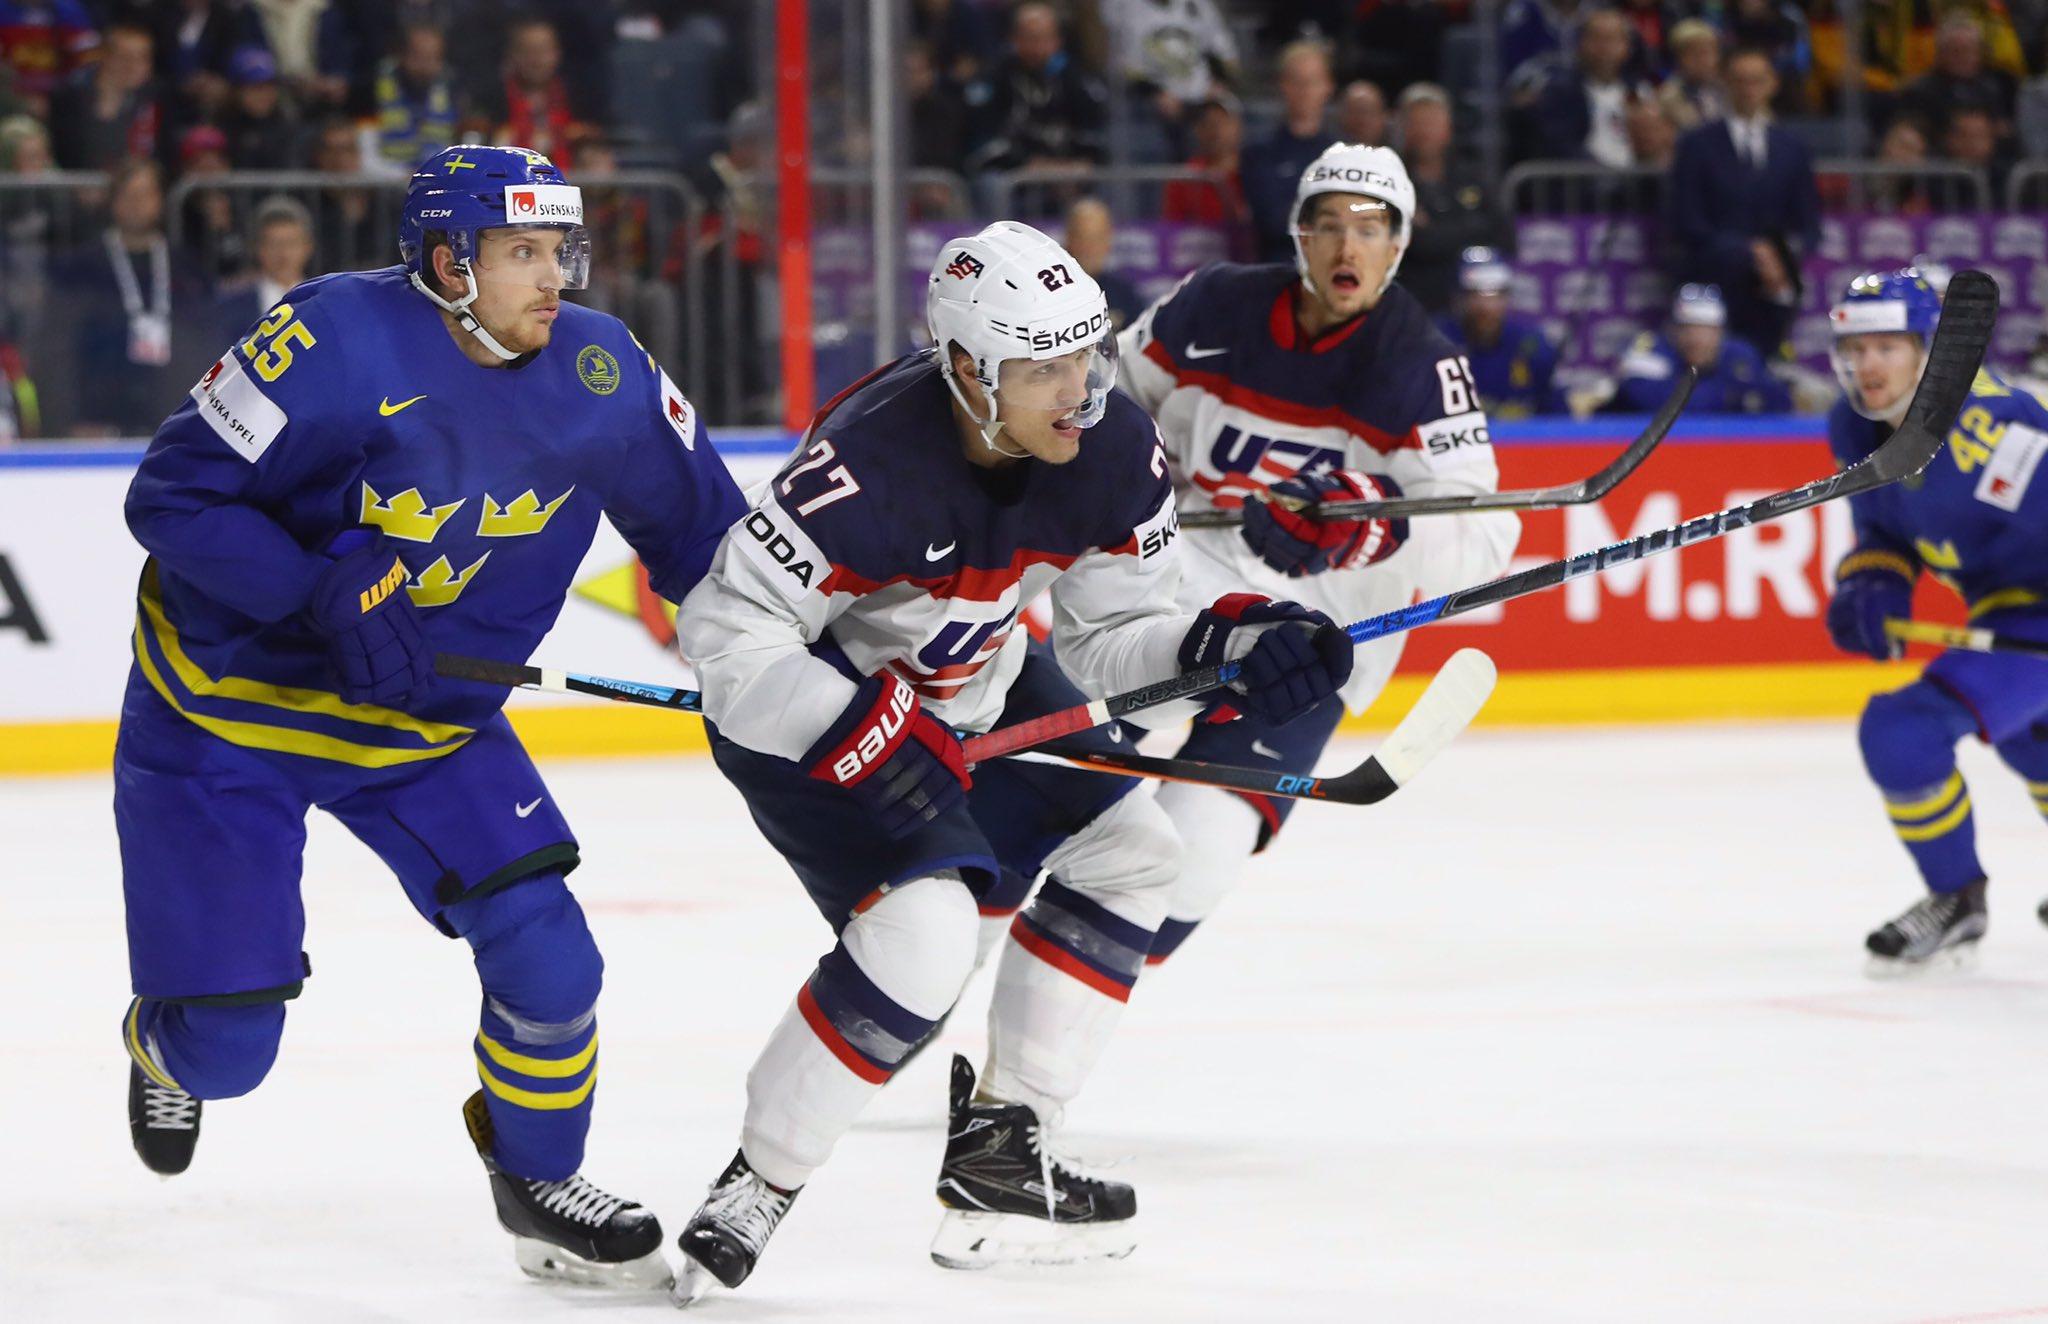 omens world hockey championship - 1024×662